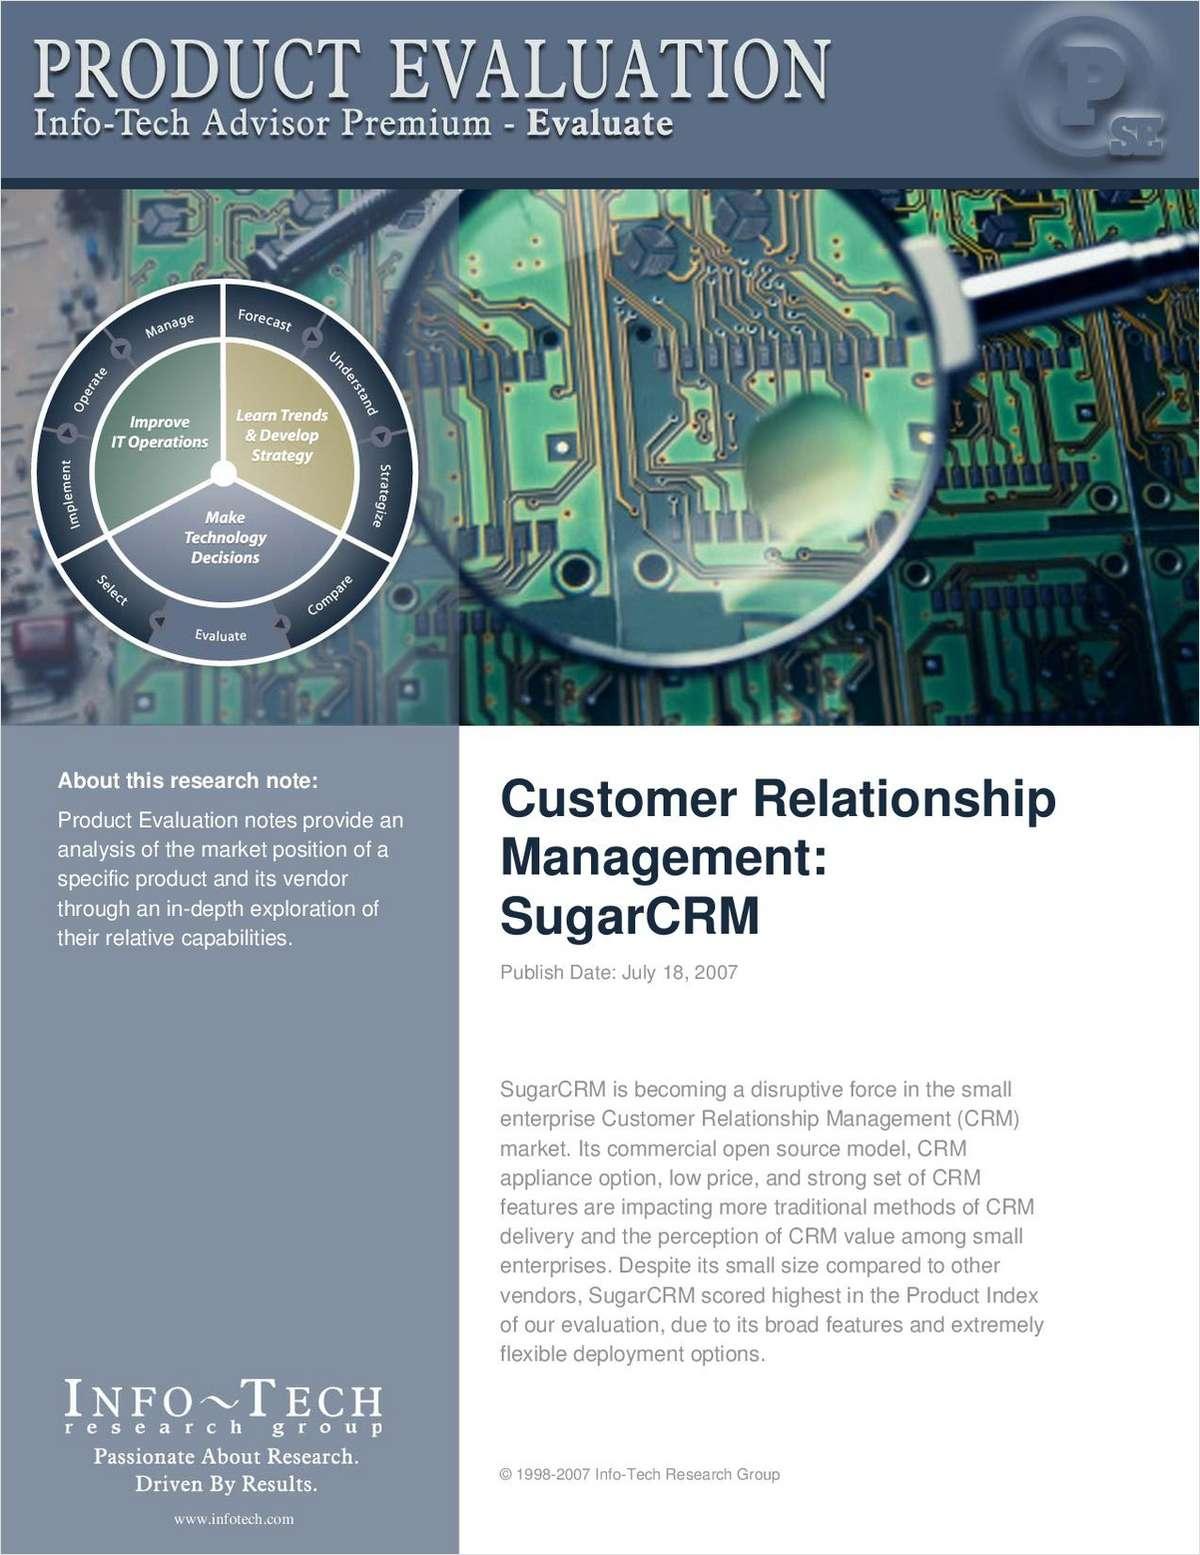 Info-Tech Research Names SugarCRM a CRM Leader